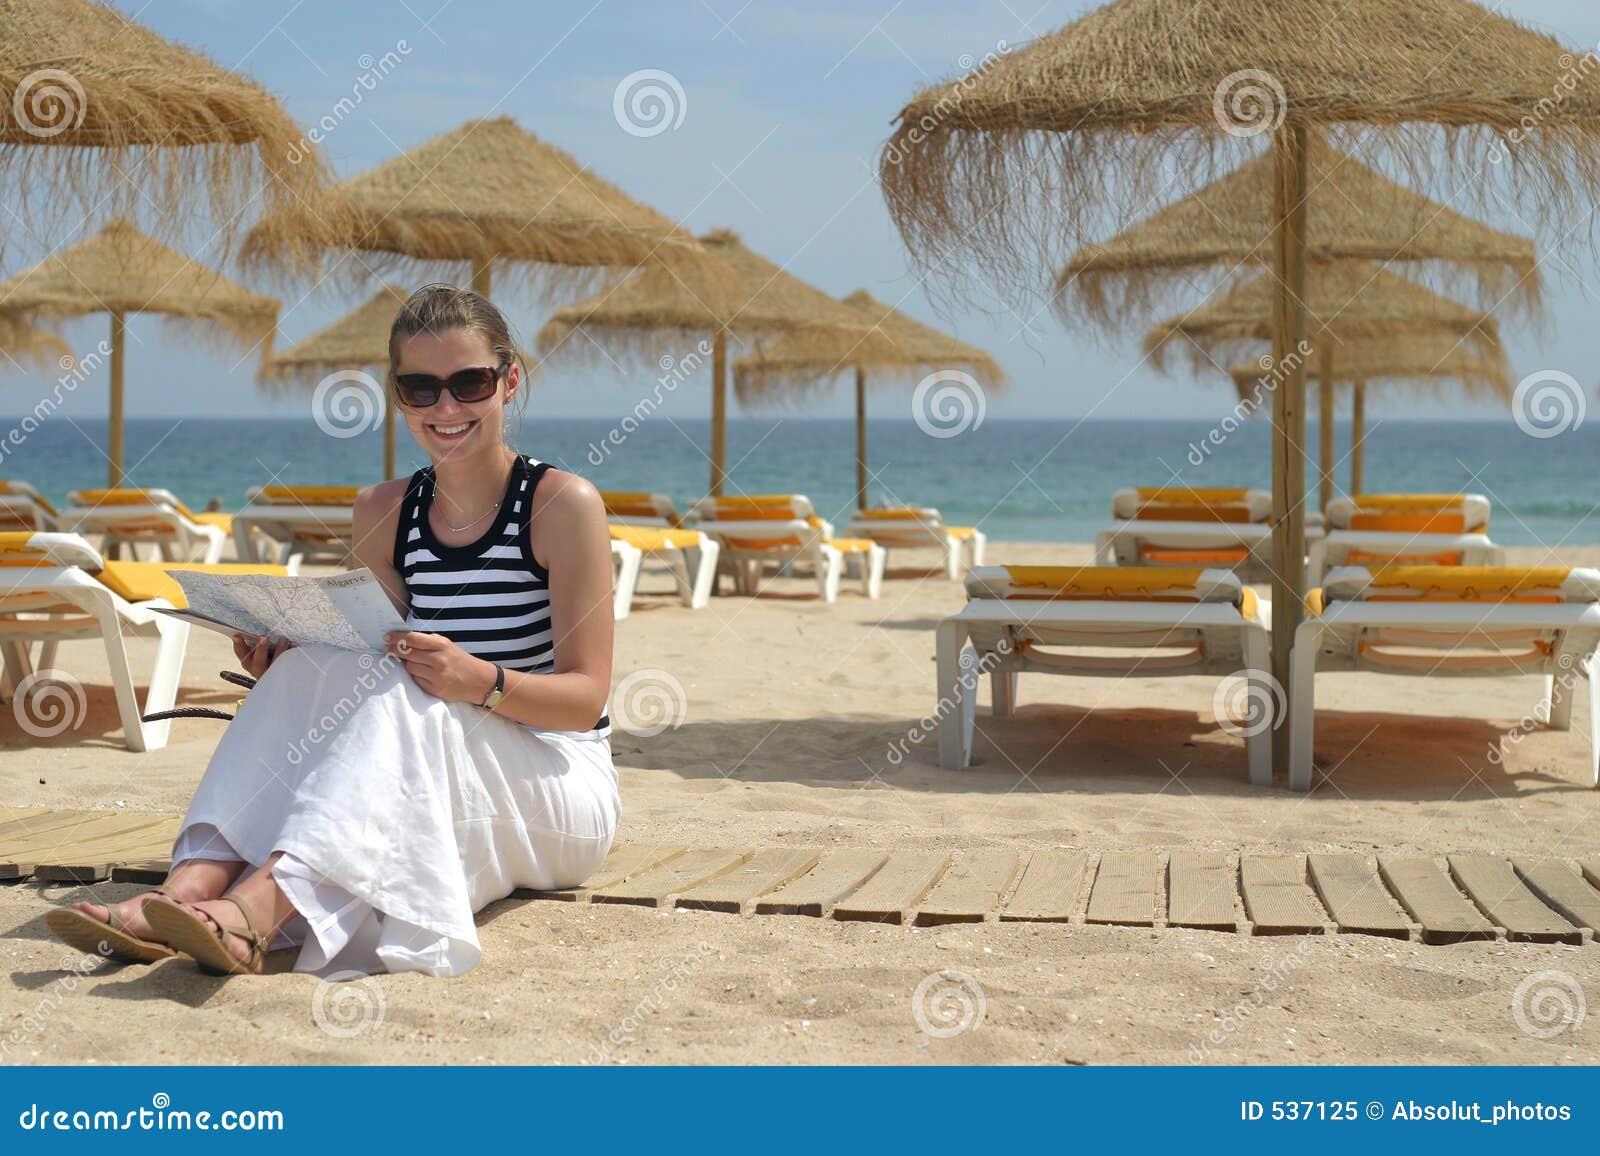 Download 地图判读 库存图片. 图片 包括有 户外, 葡萄牙, 女性, 影子, 水平, 研究, 晒日光浴, 重新创建, 海运 - 537125